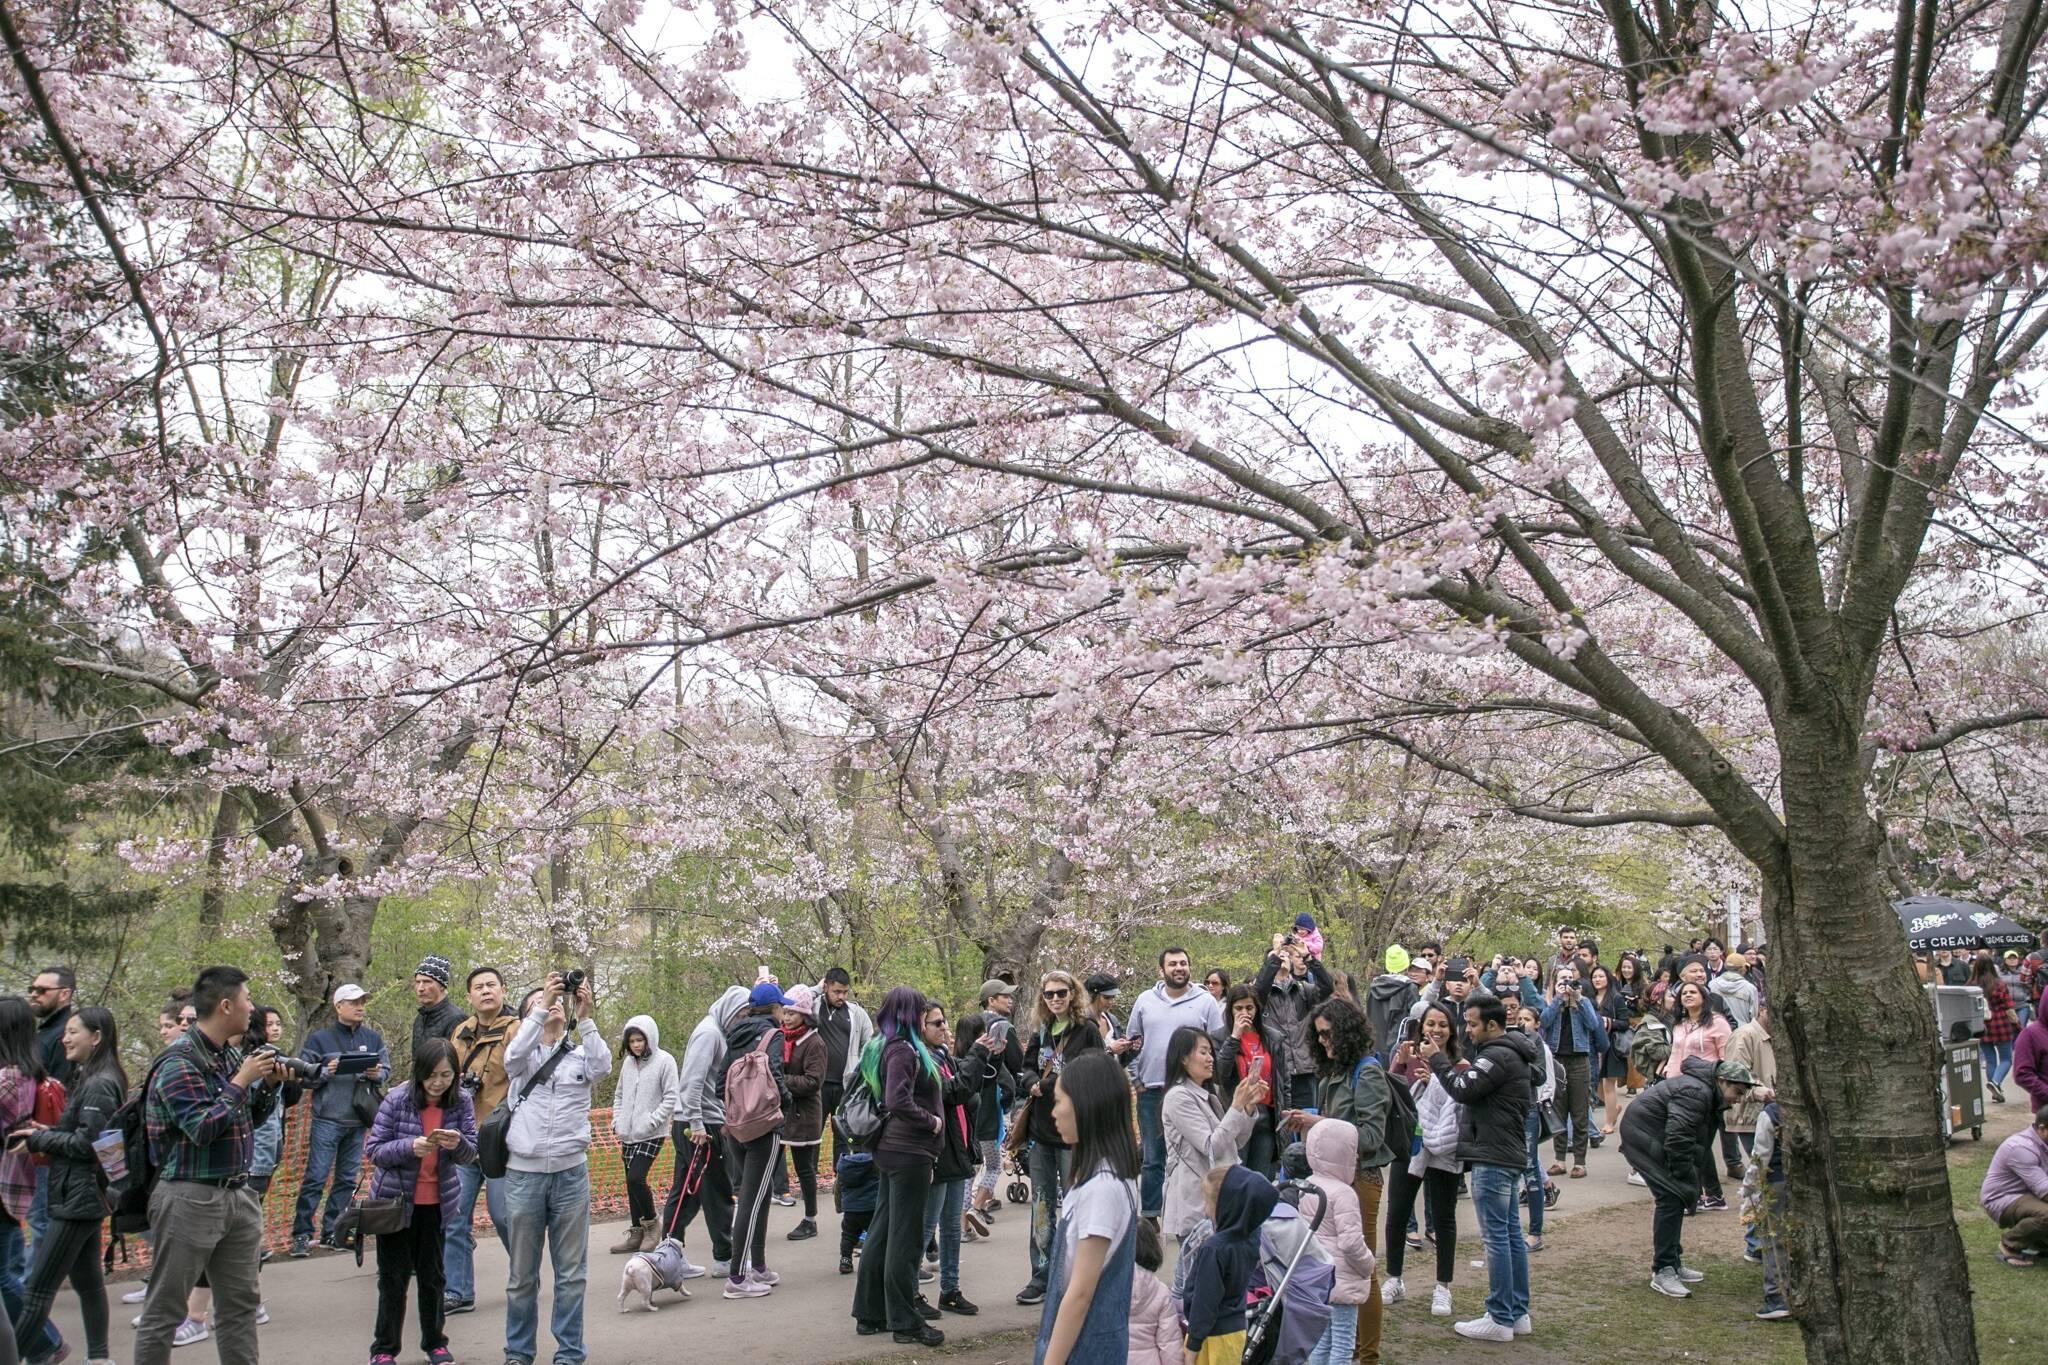 high park cherry blossoms 2021